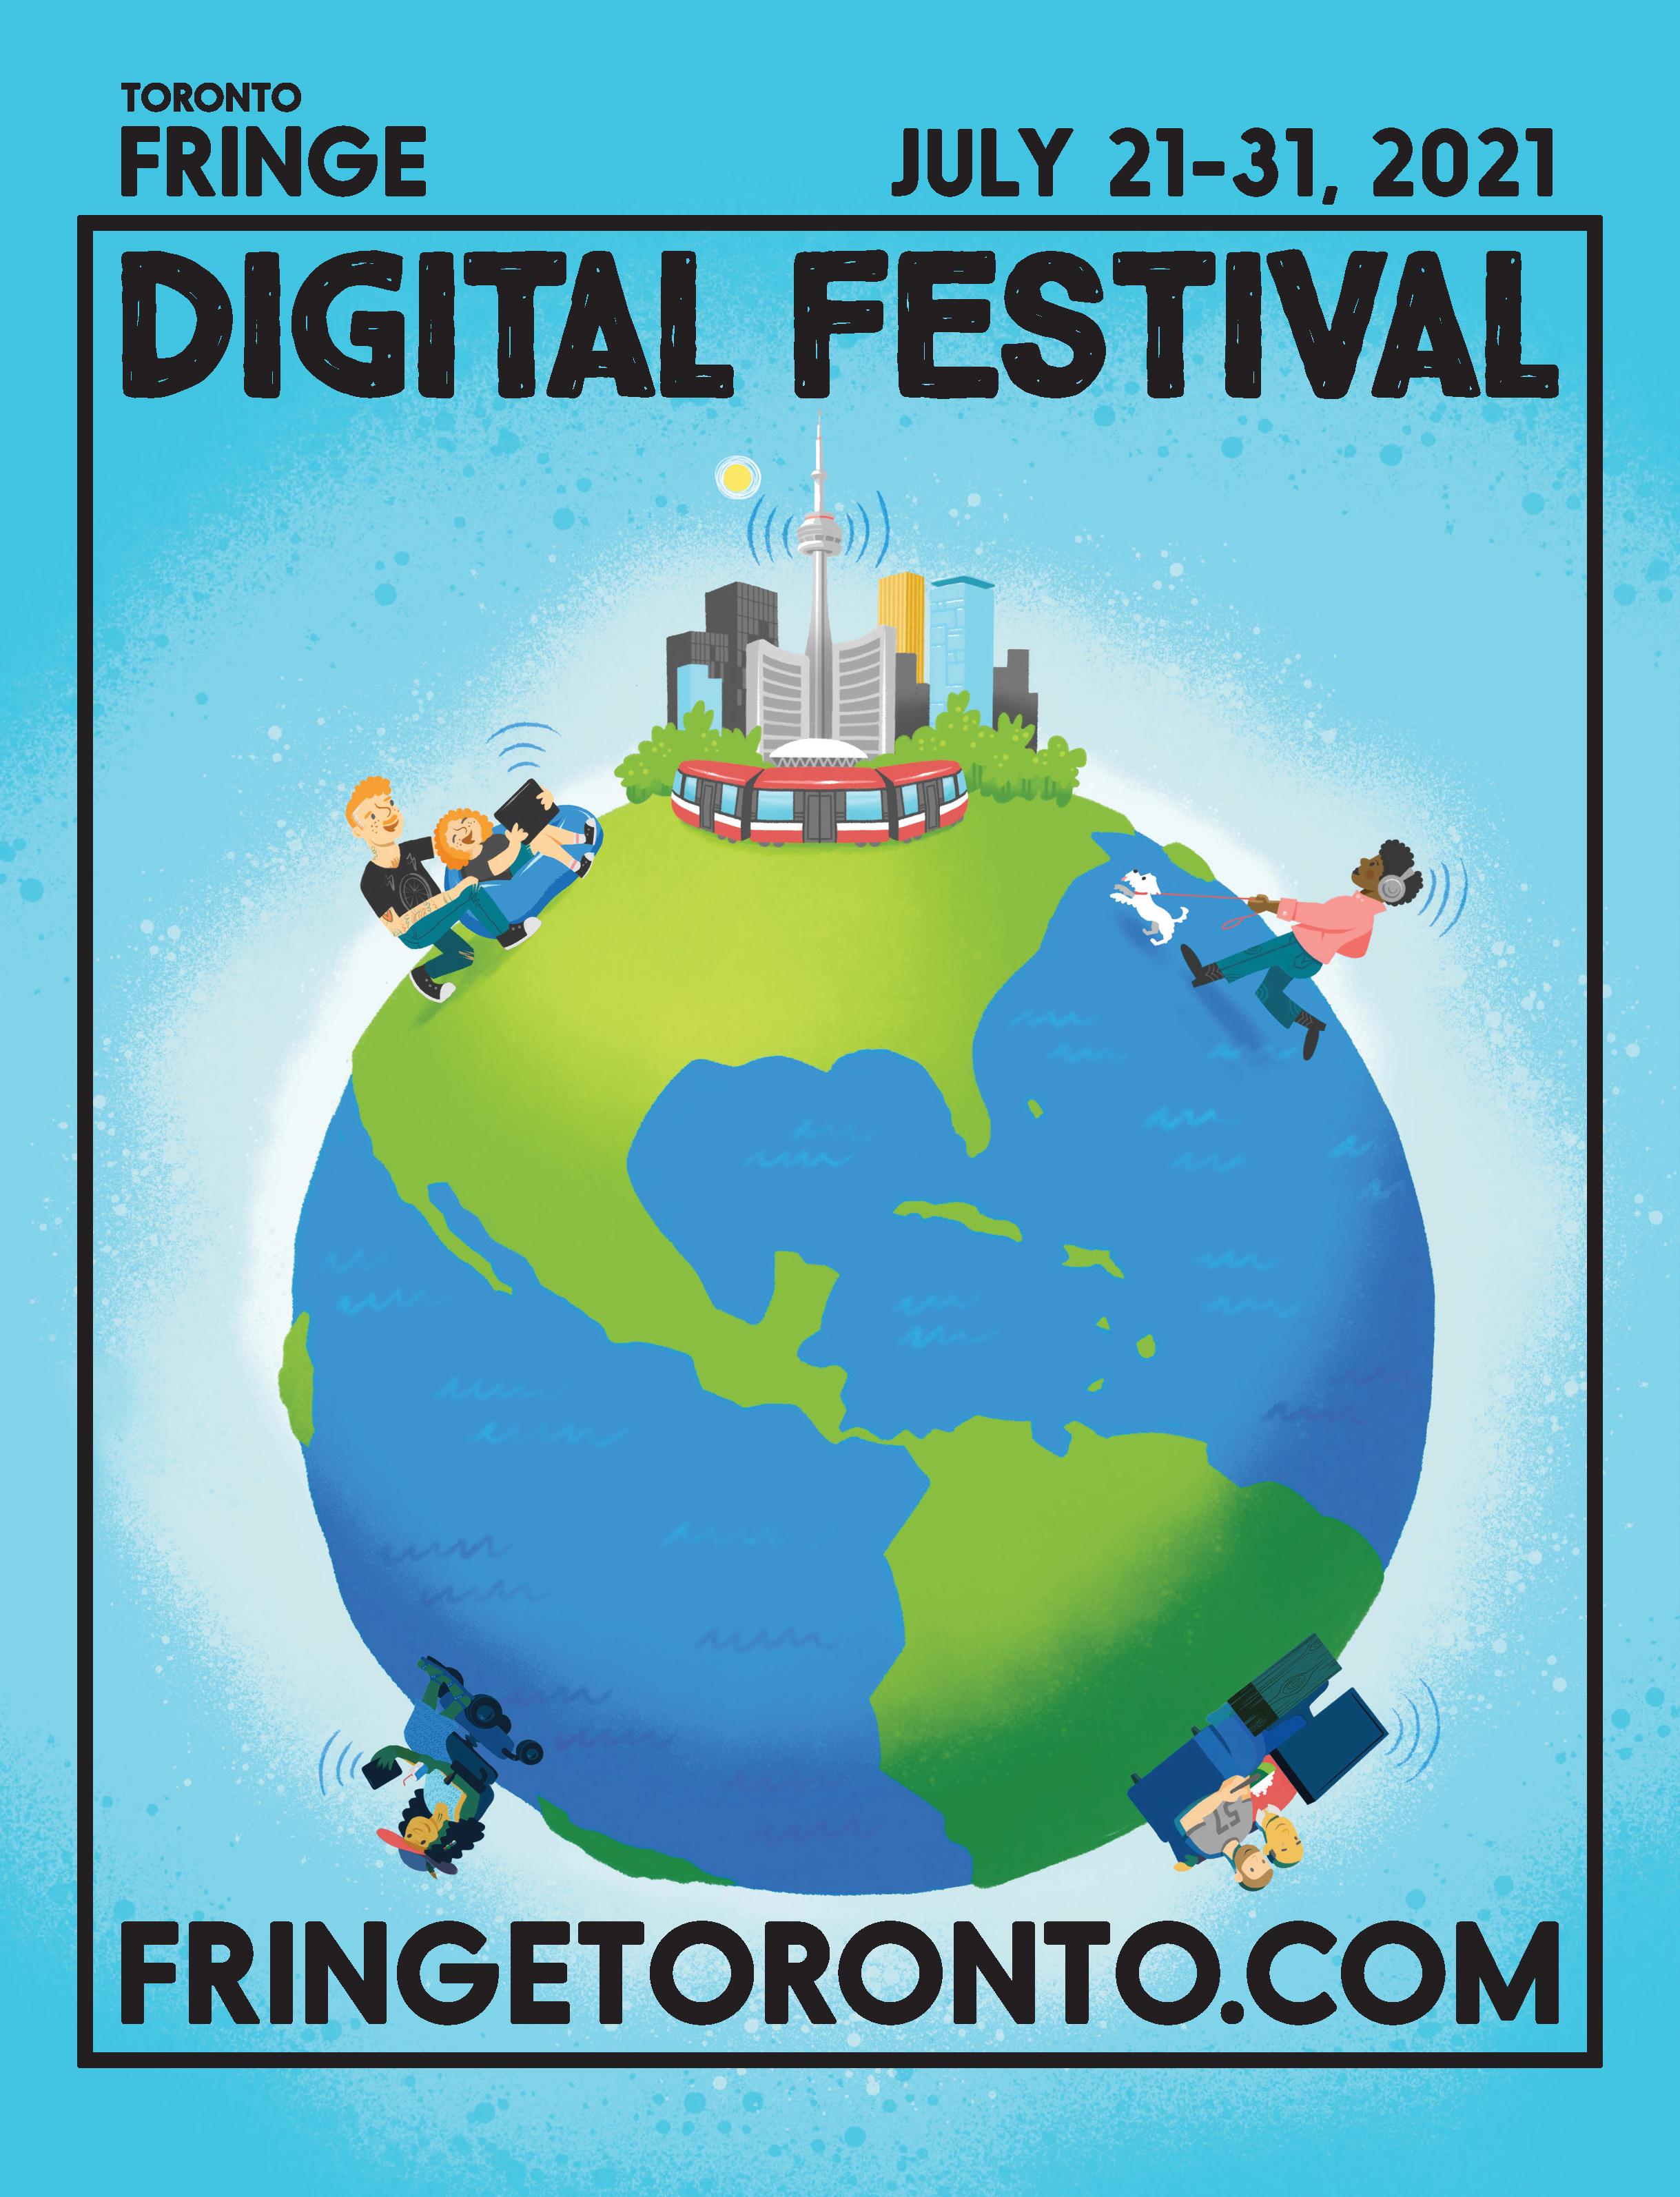 2021 Digital Program Guide Cover